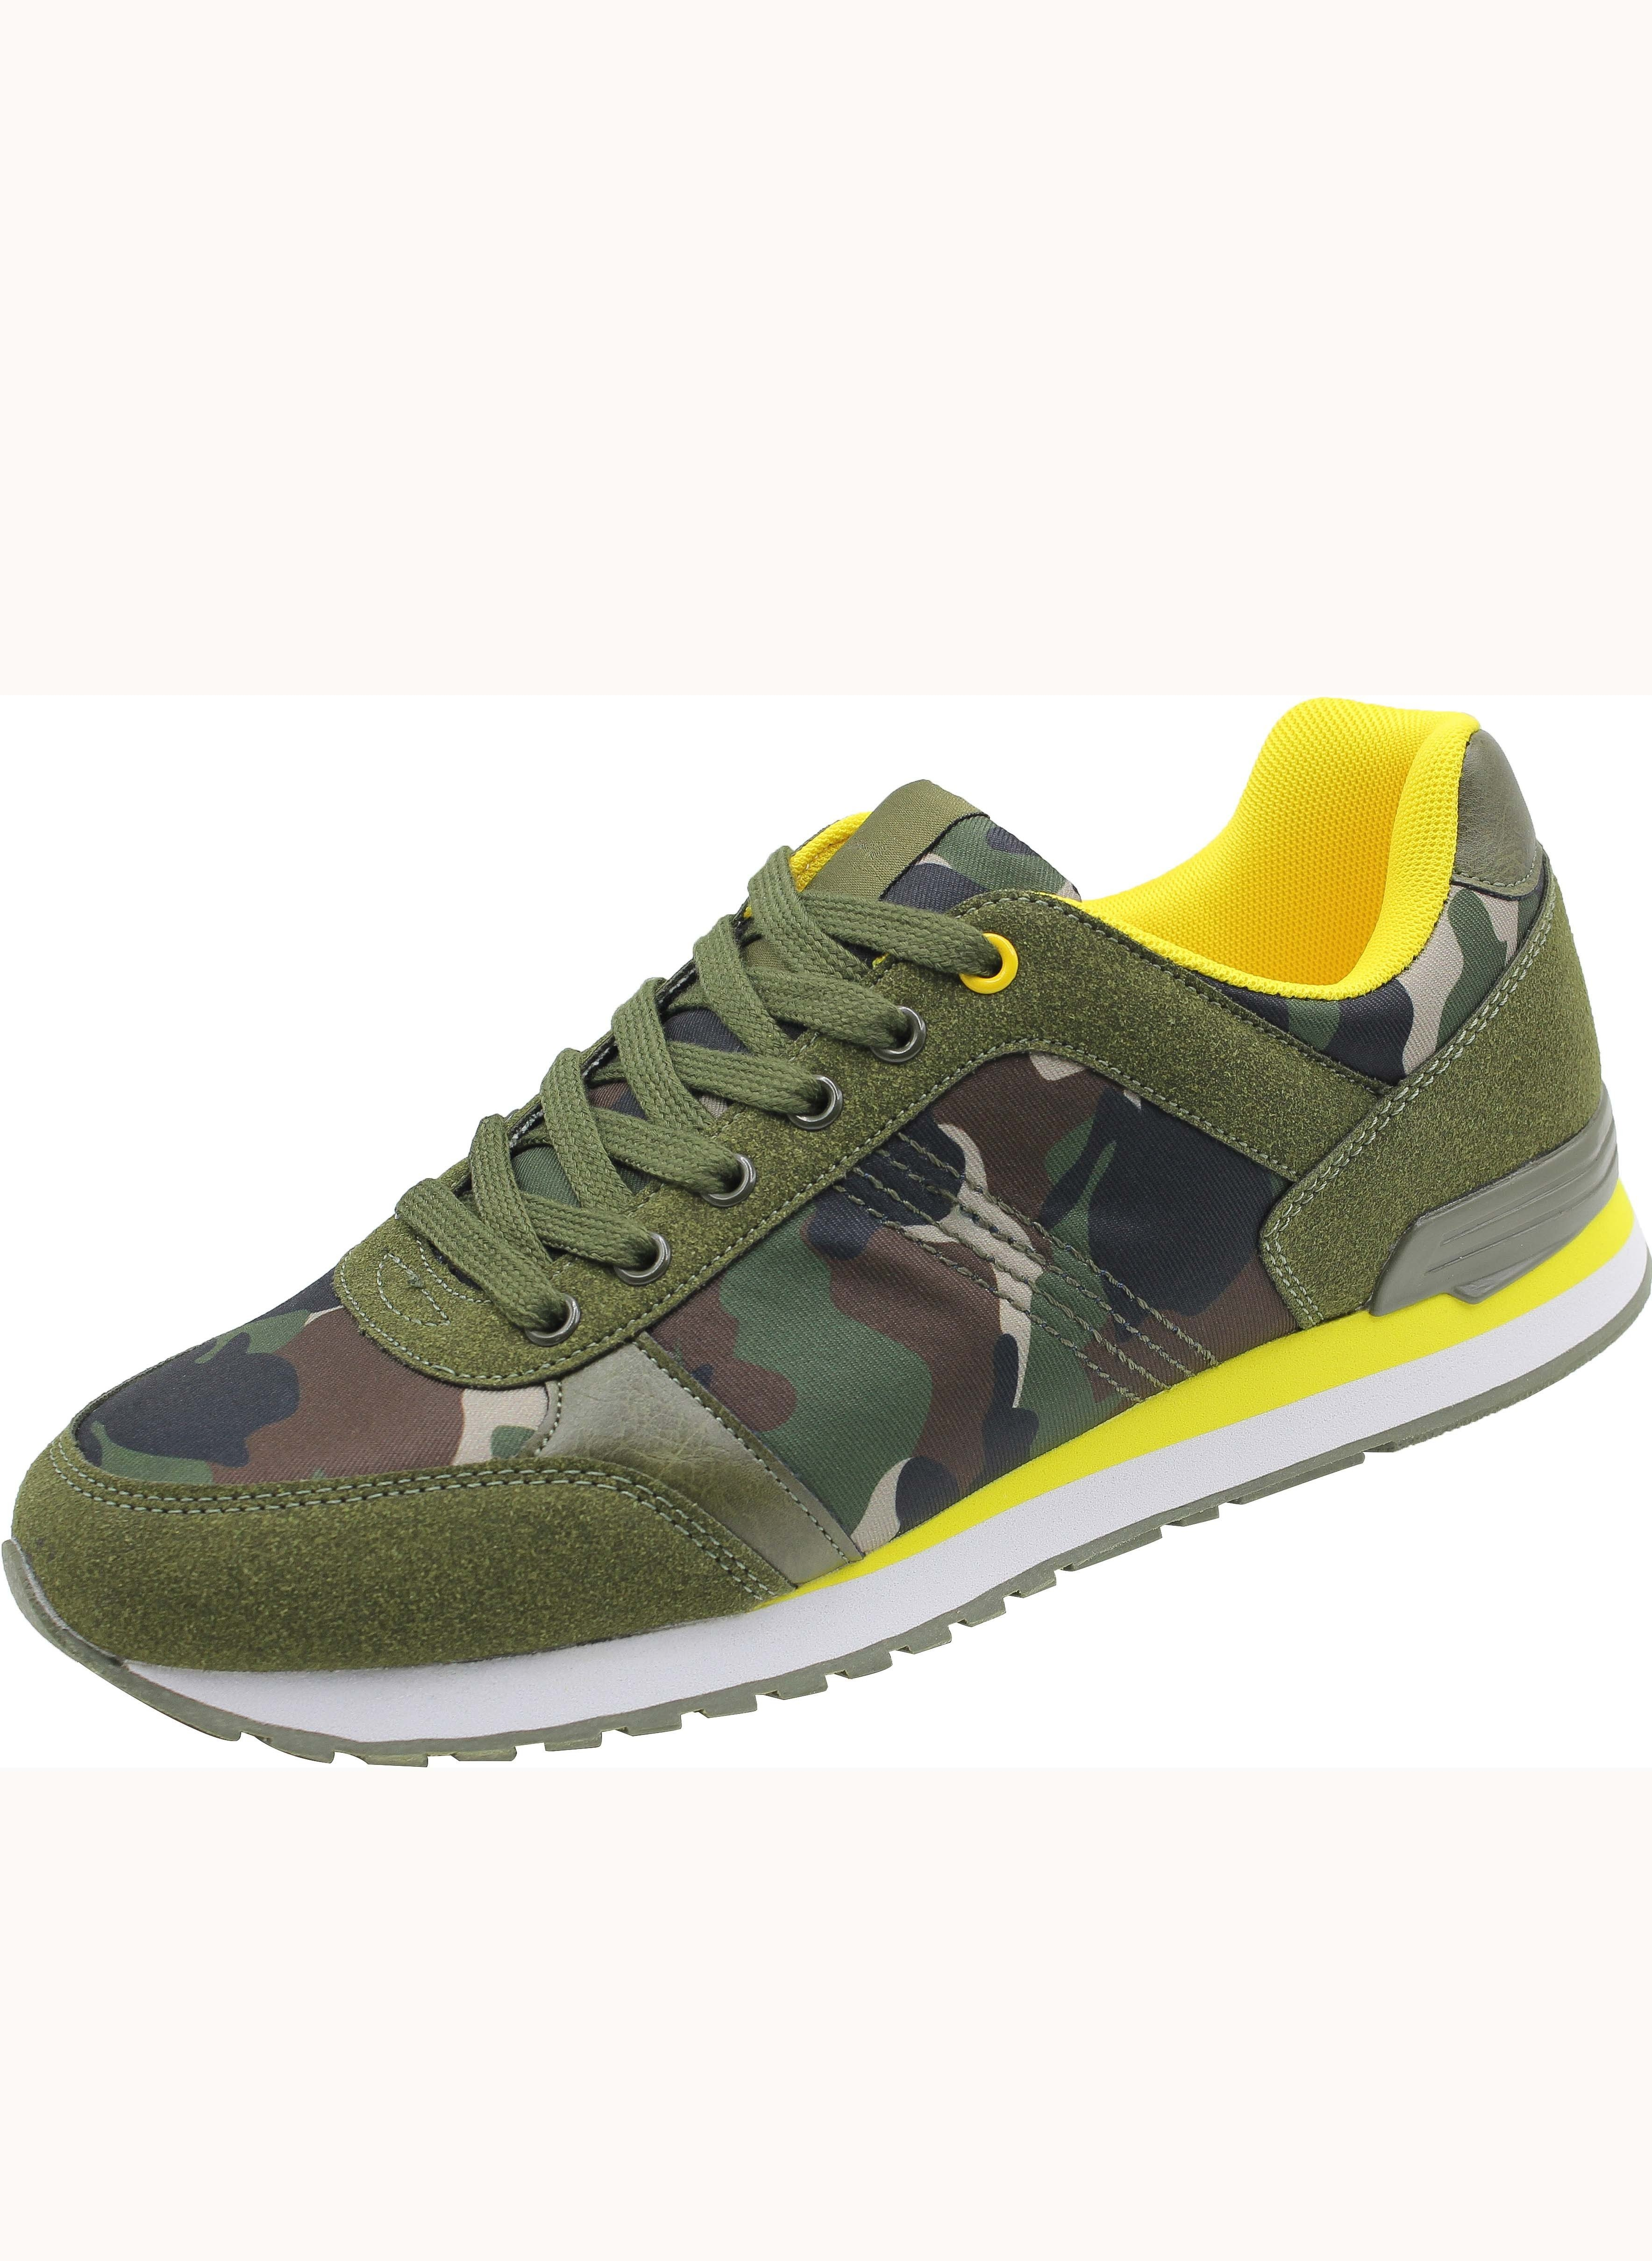 H-Sneaker, Tarn-Look 40 059